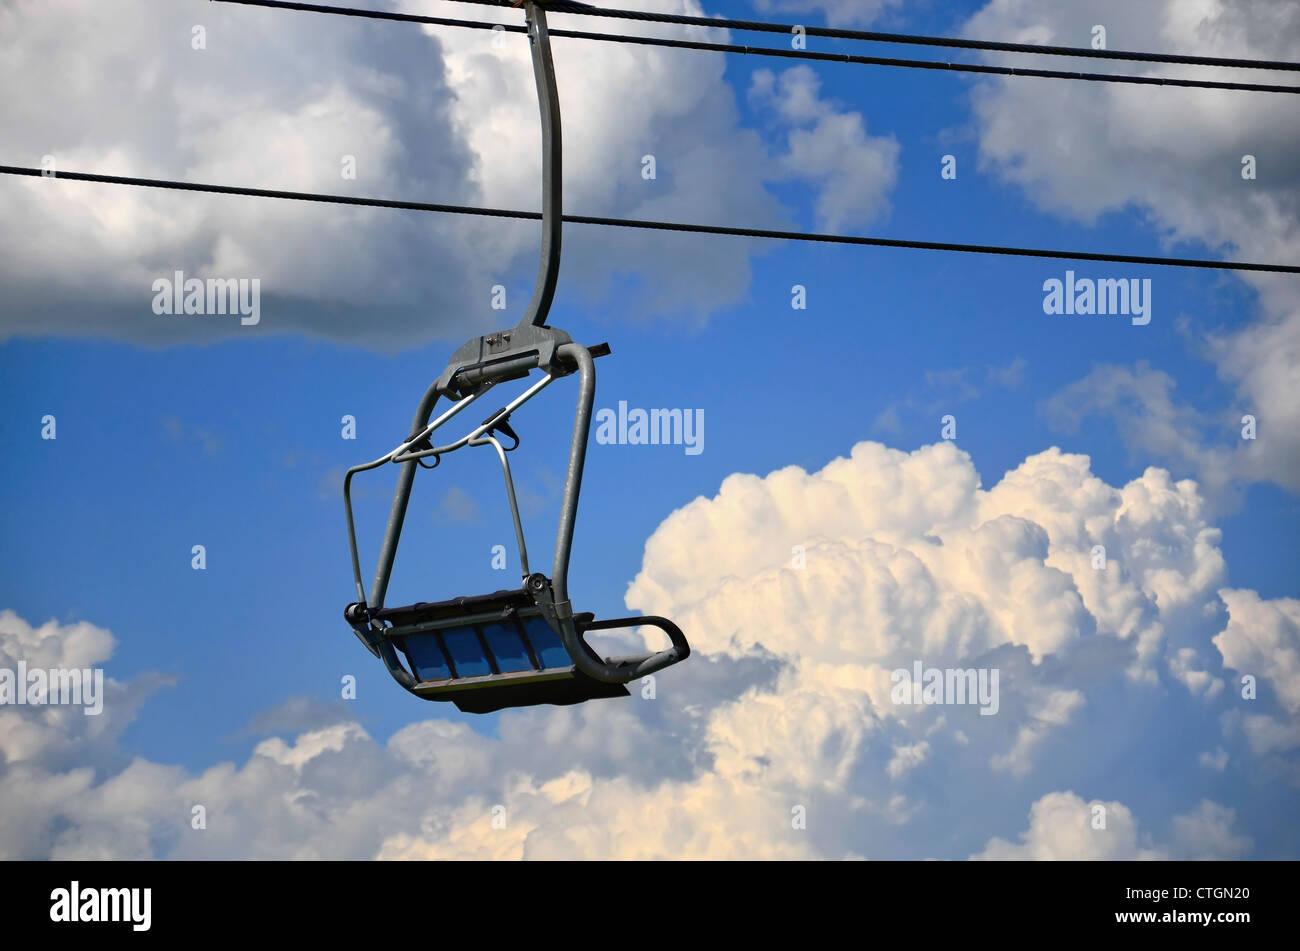 Empty Ski Lift Stock Photos & Empty Ski Lift Stock Images - Alamy